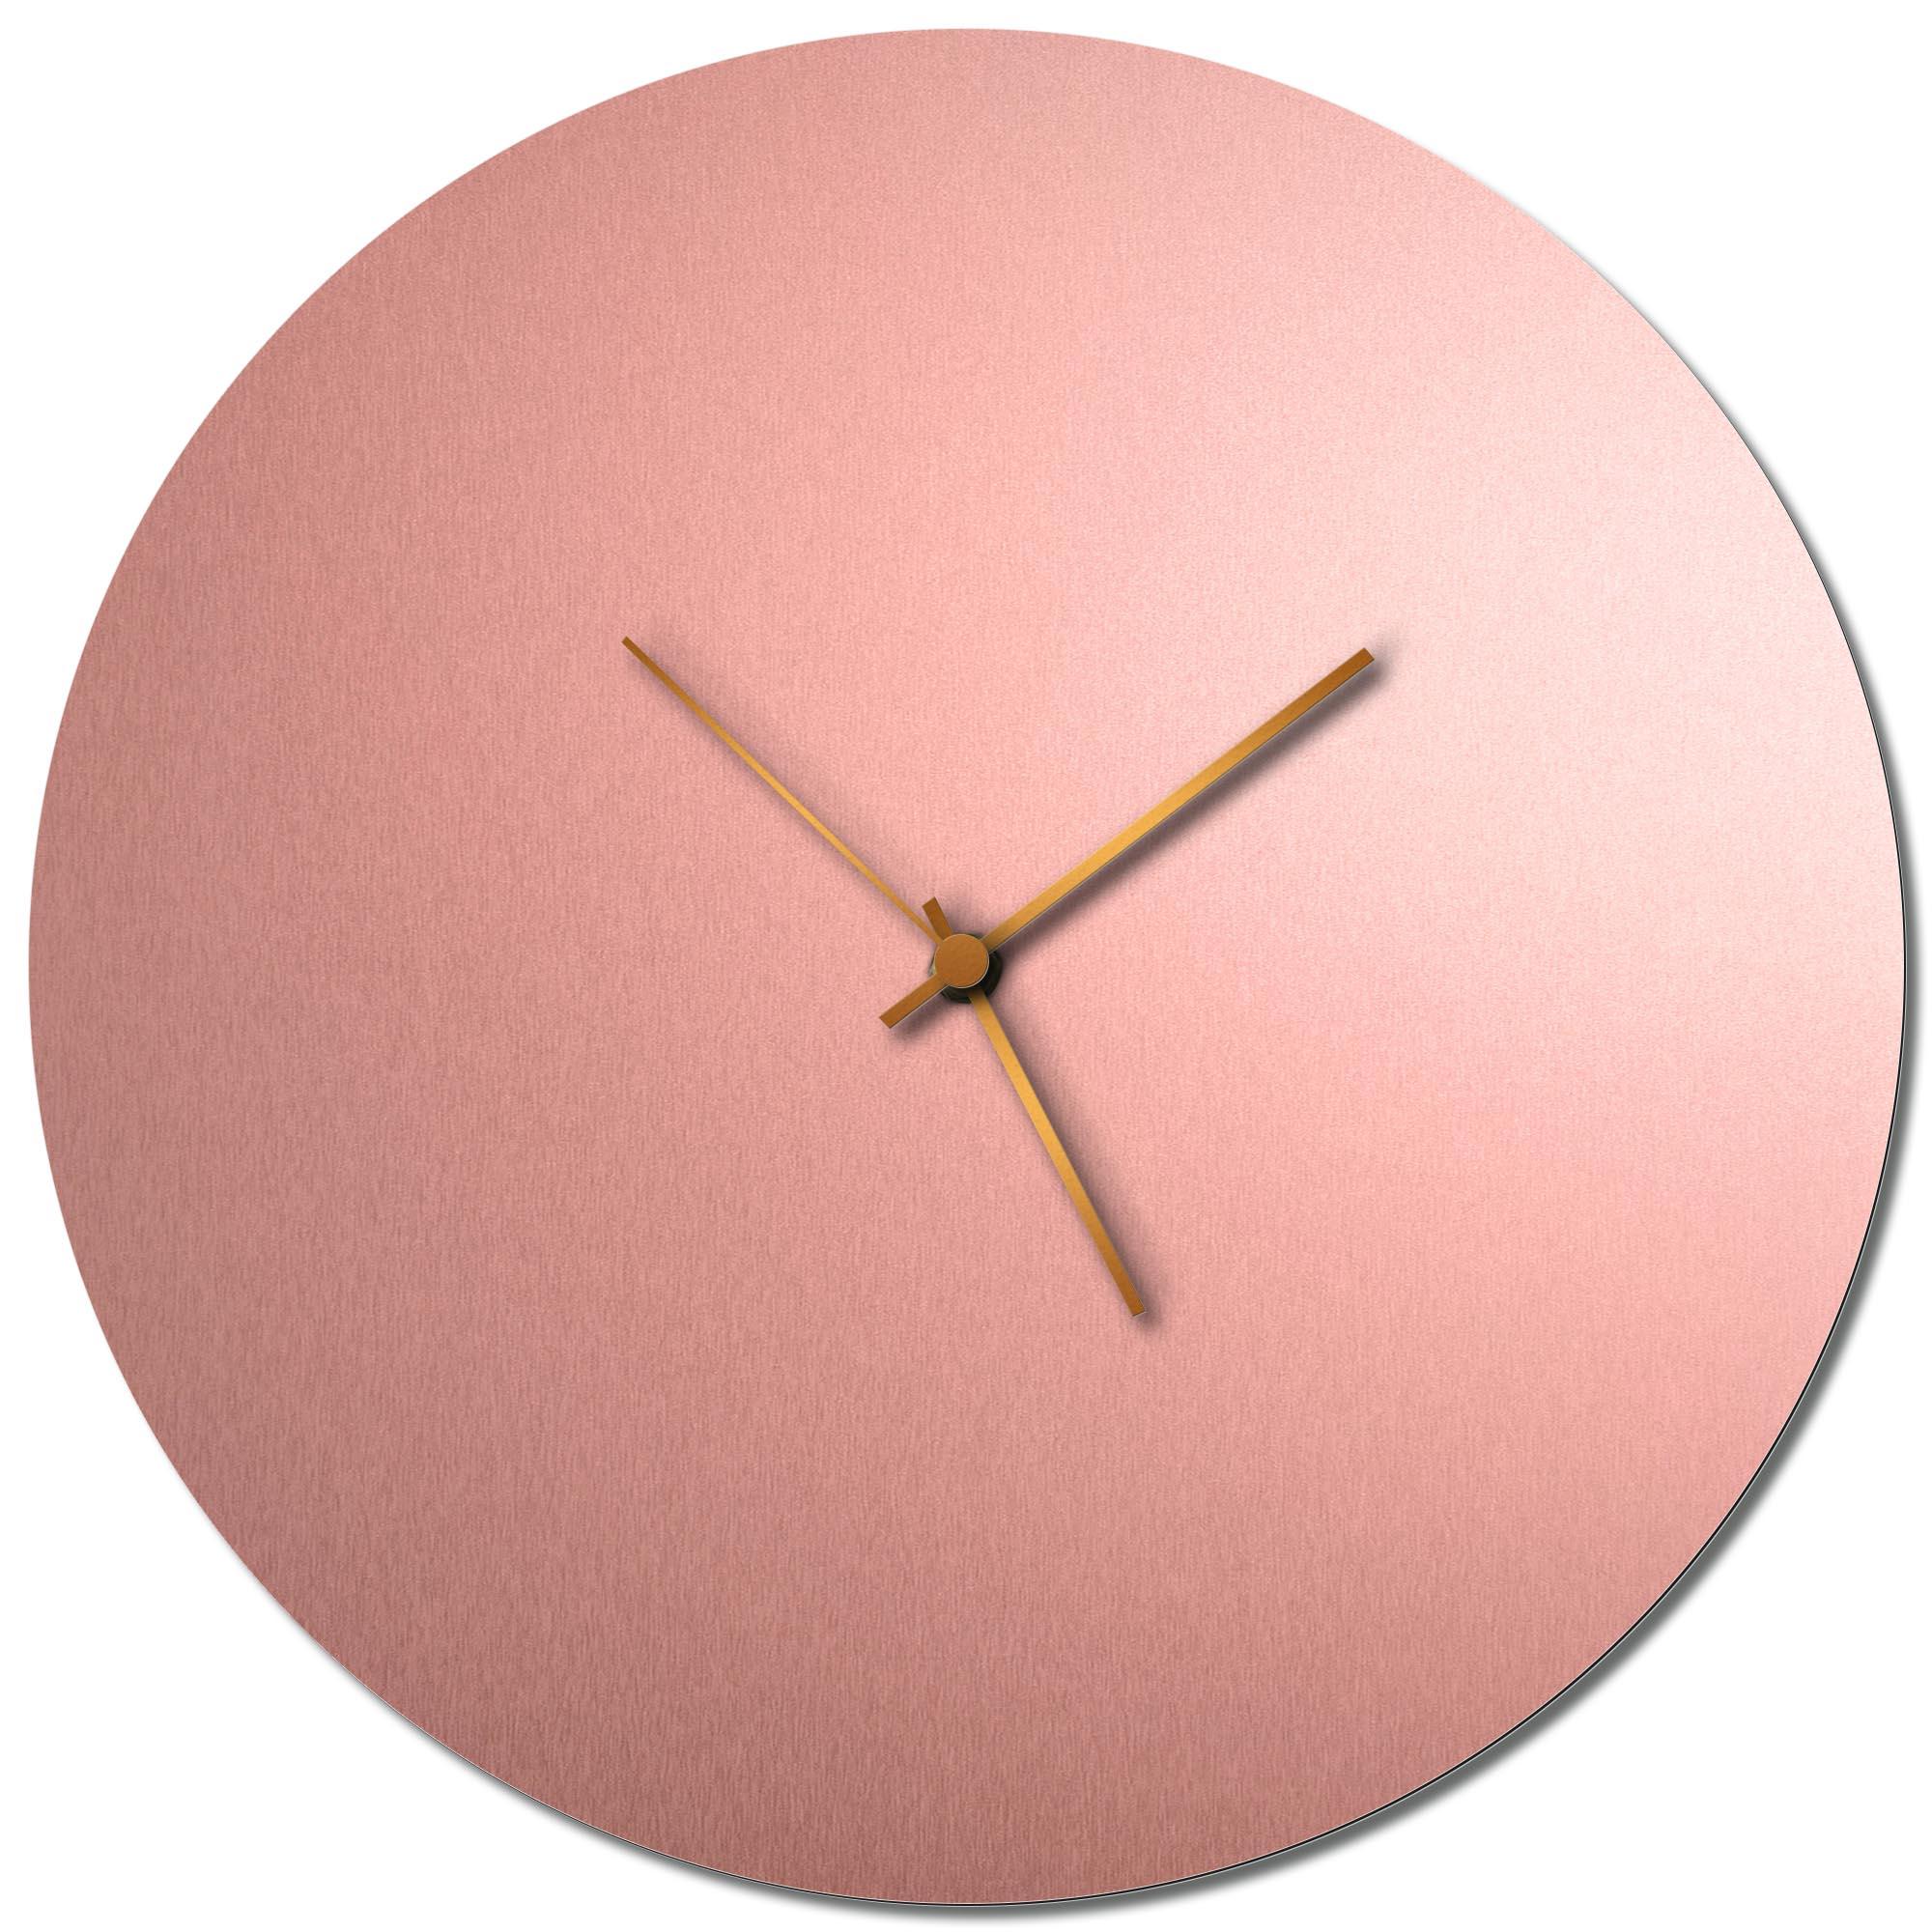 Adam Schwoeppe 'Coppersmith Circle Clock Large Bronze' Midcentury Modern Style Wall Clock